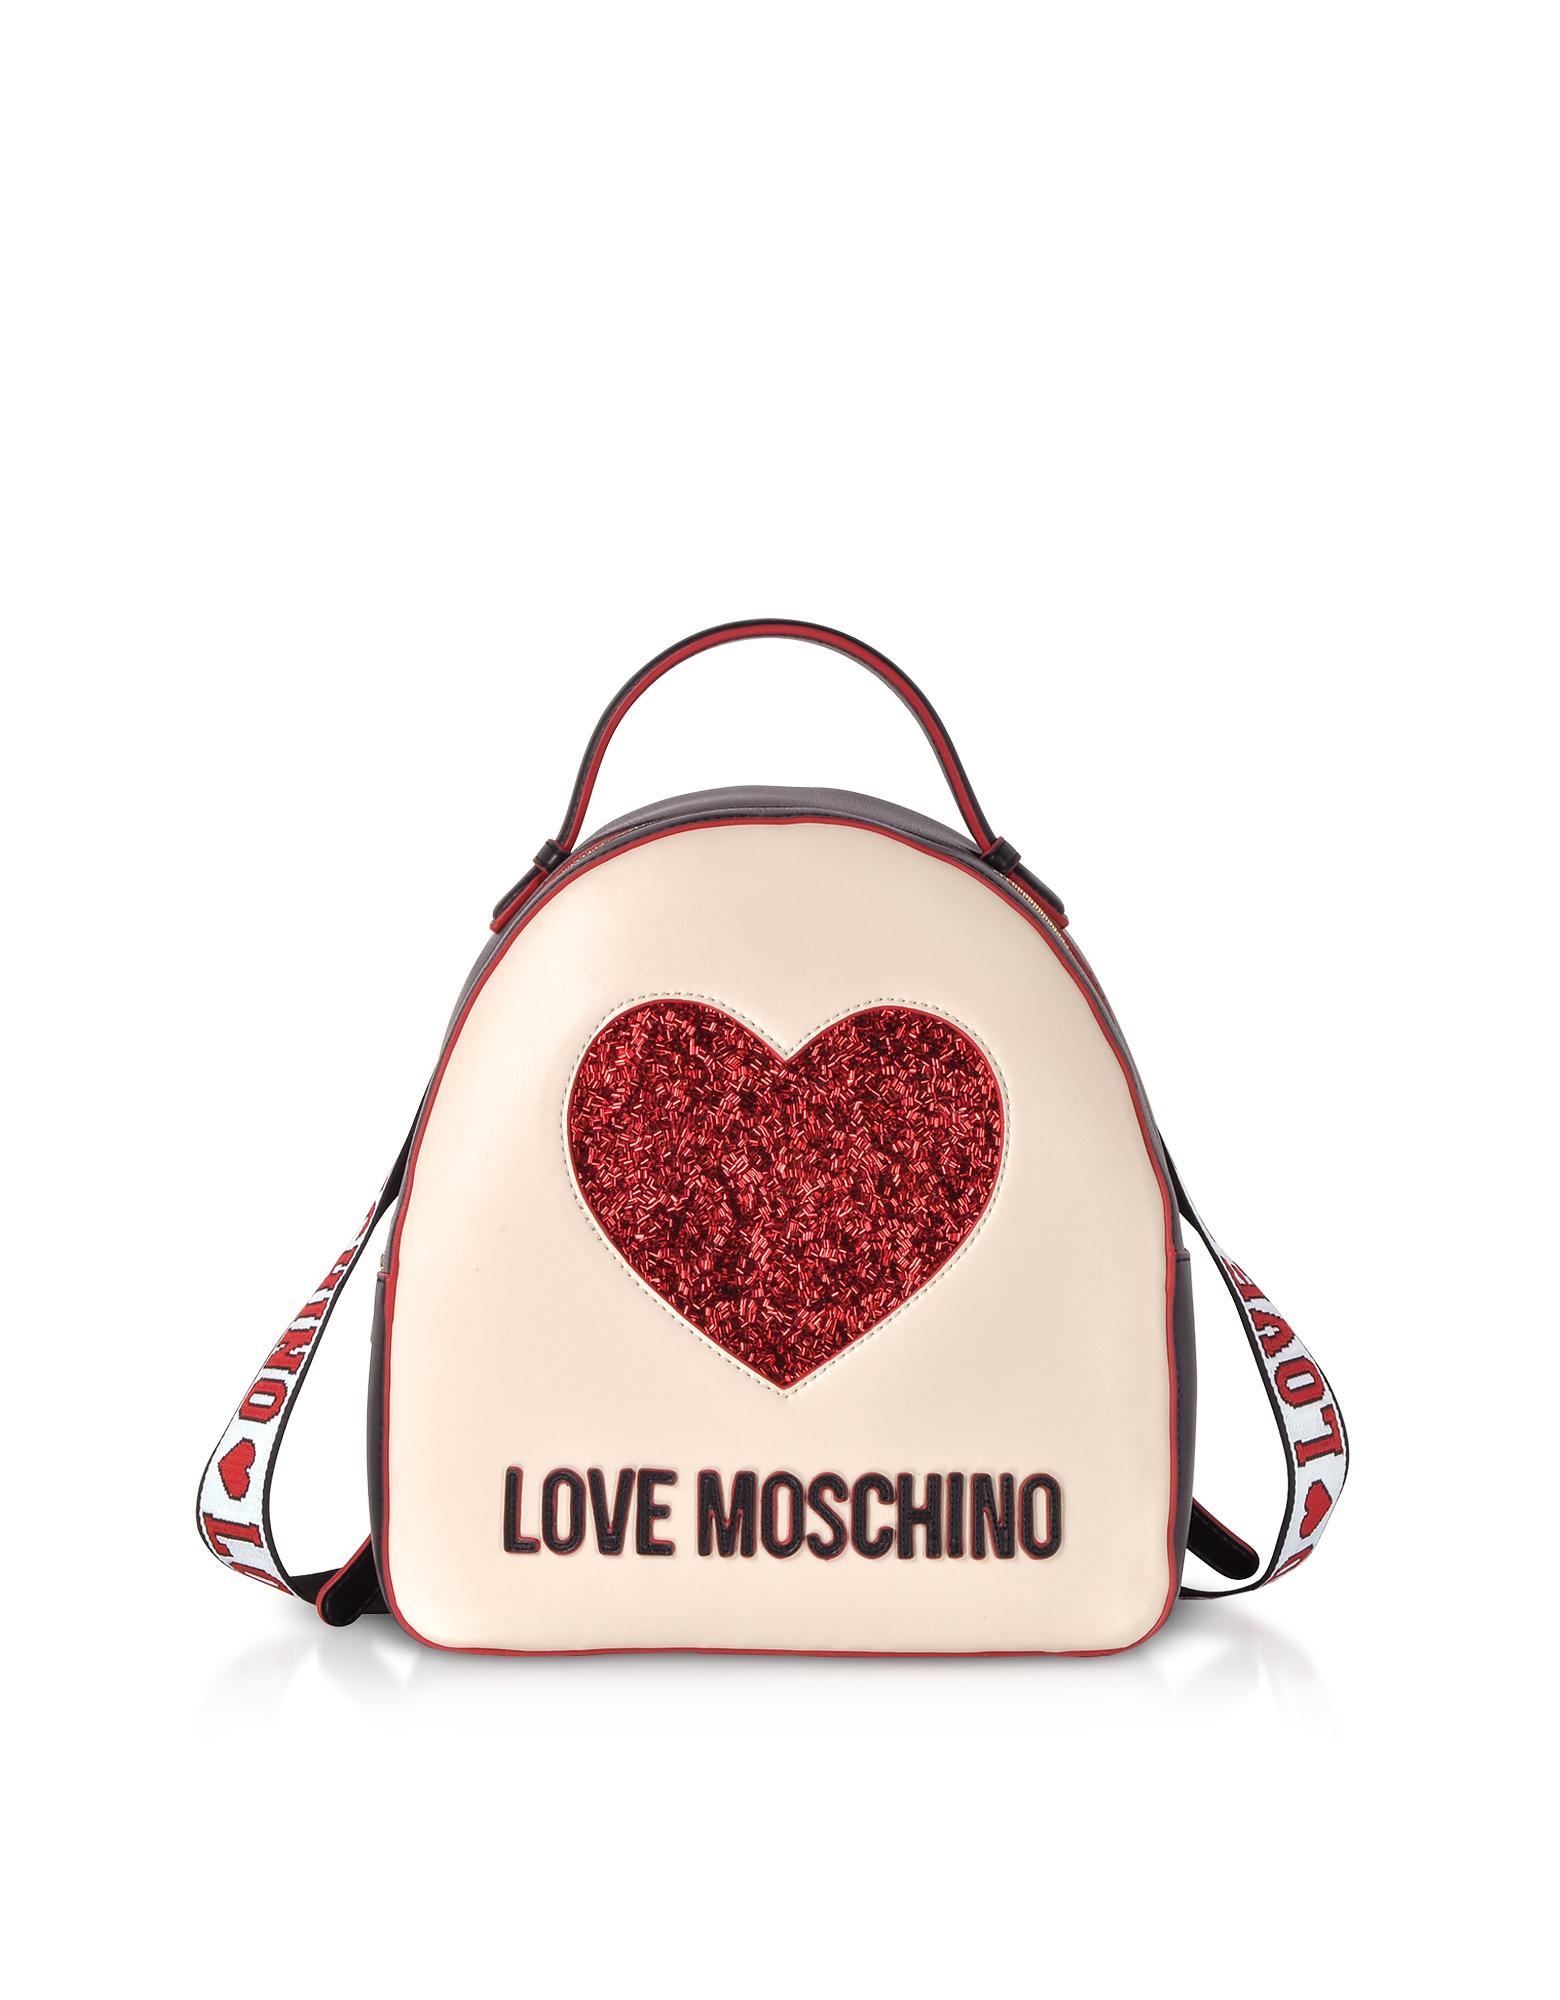 Love Moschino Handbags, Ivory & Black Heart Backpack